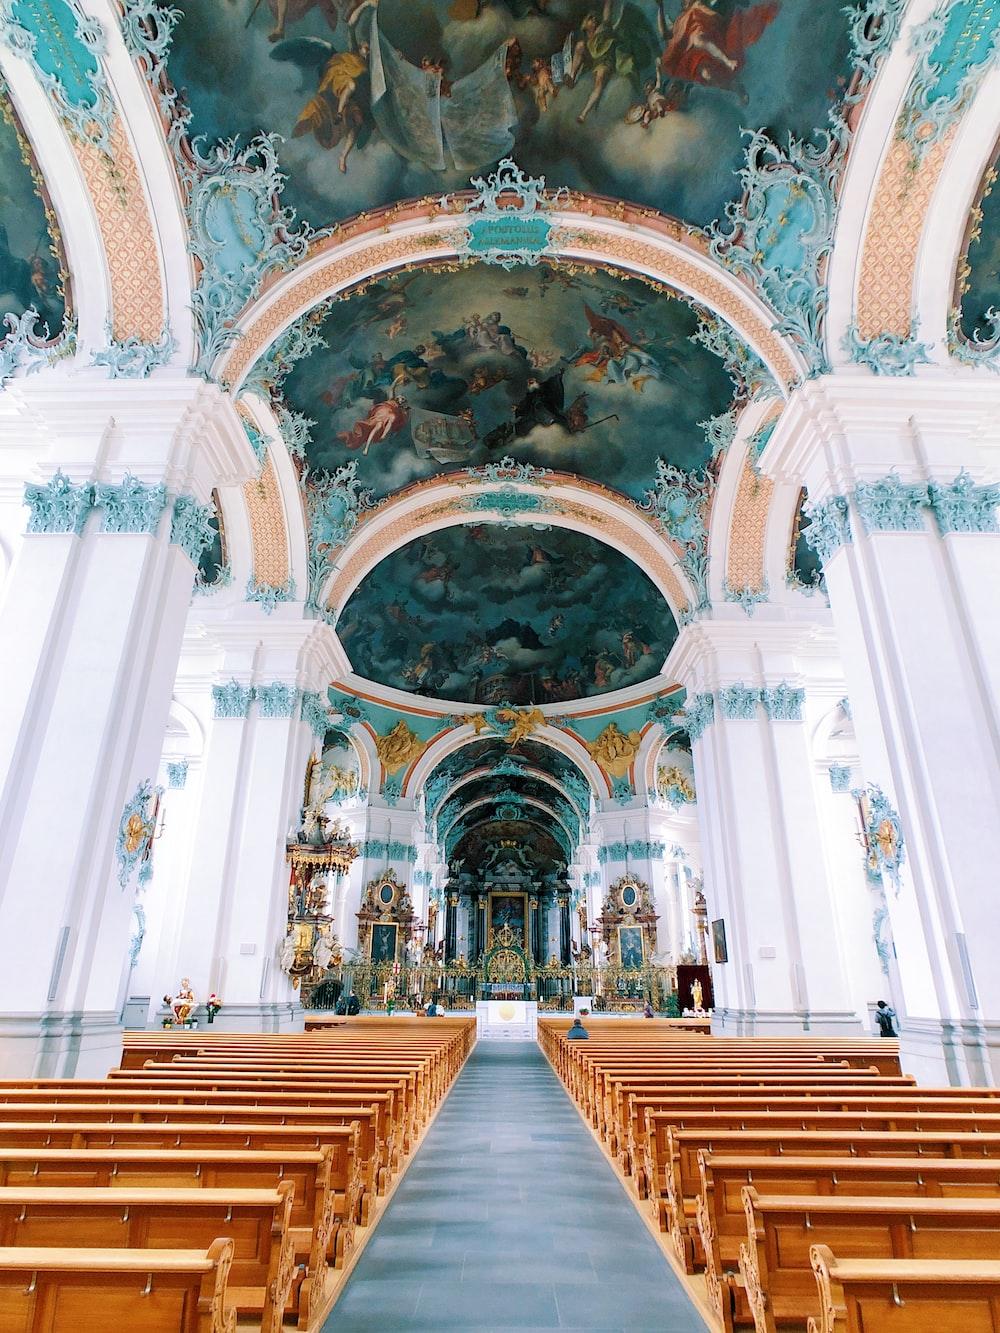 pews inside church